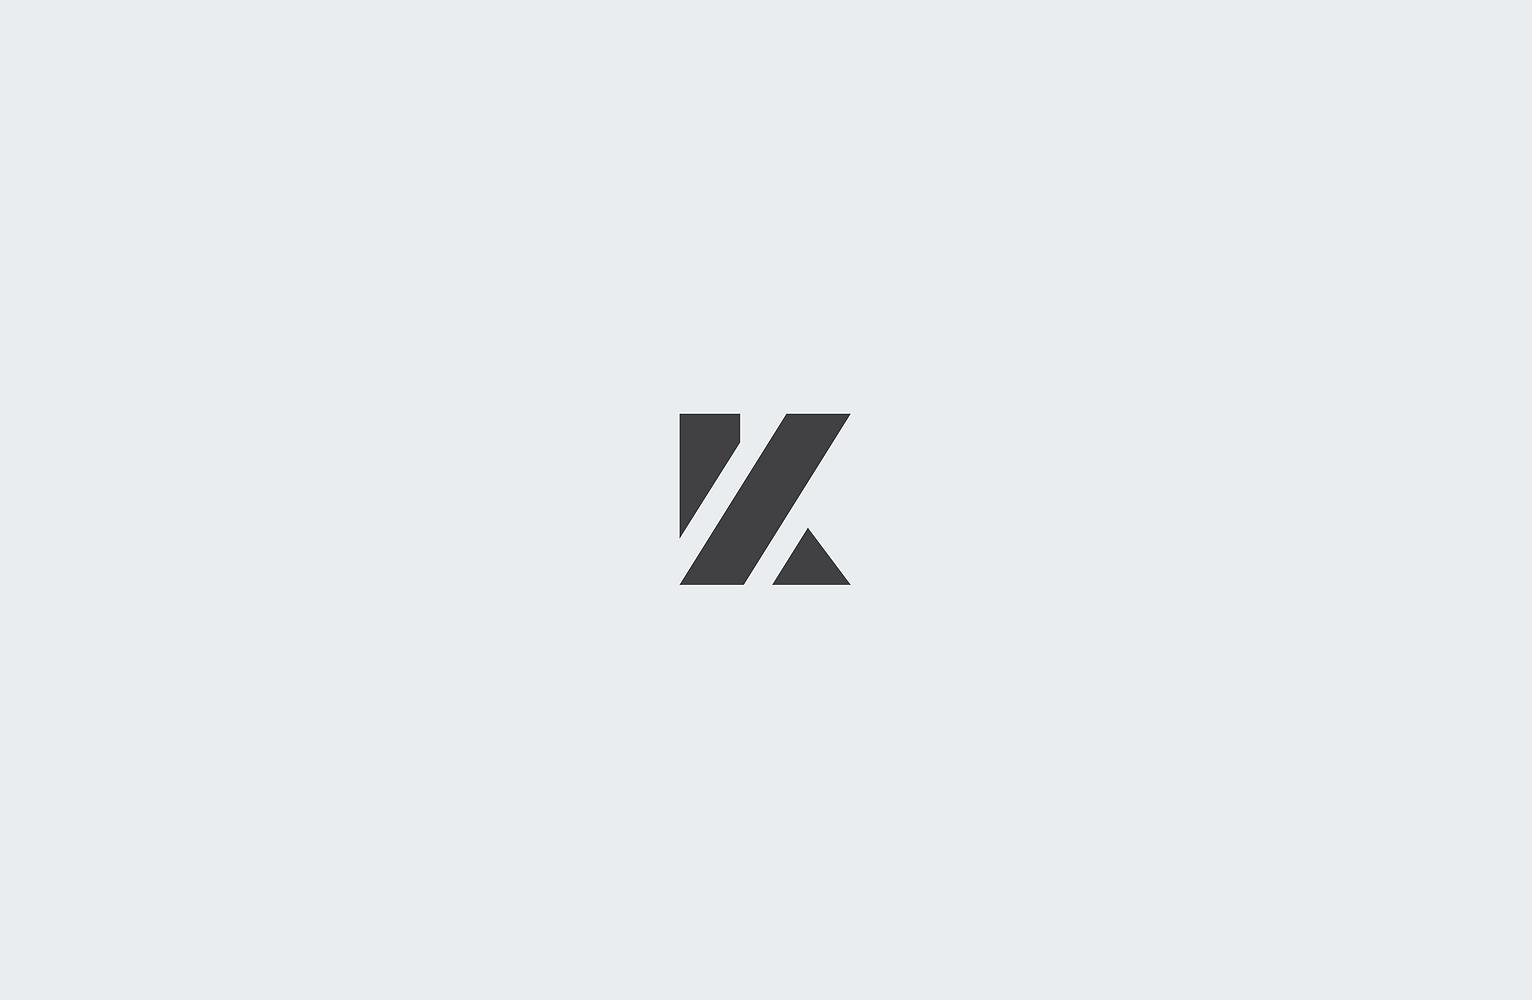 k_lockupweb.png